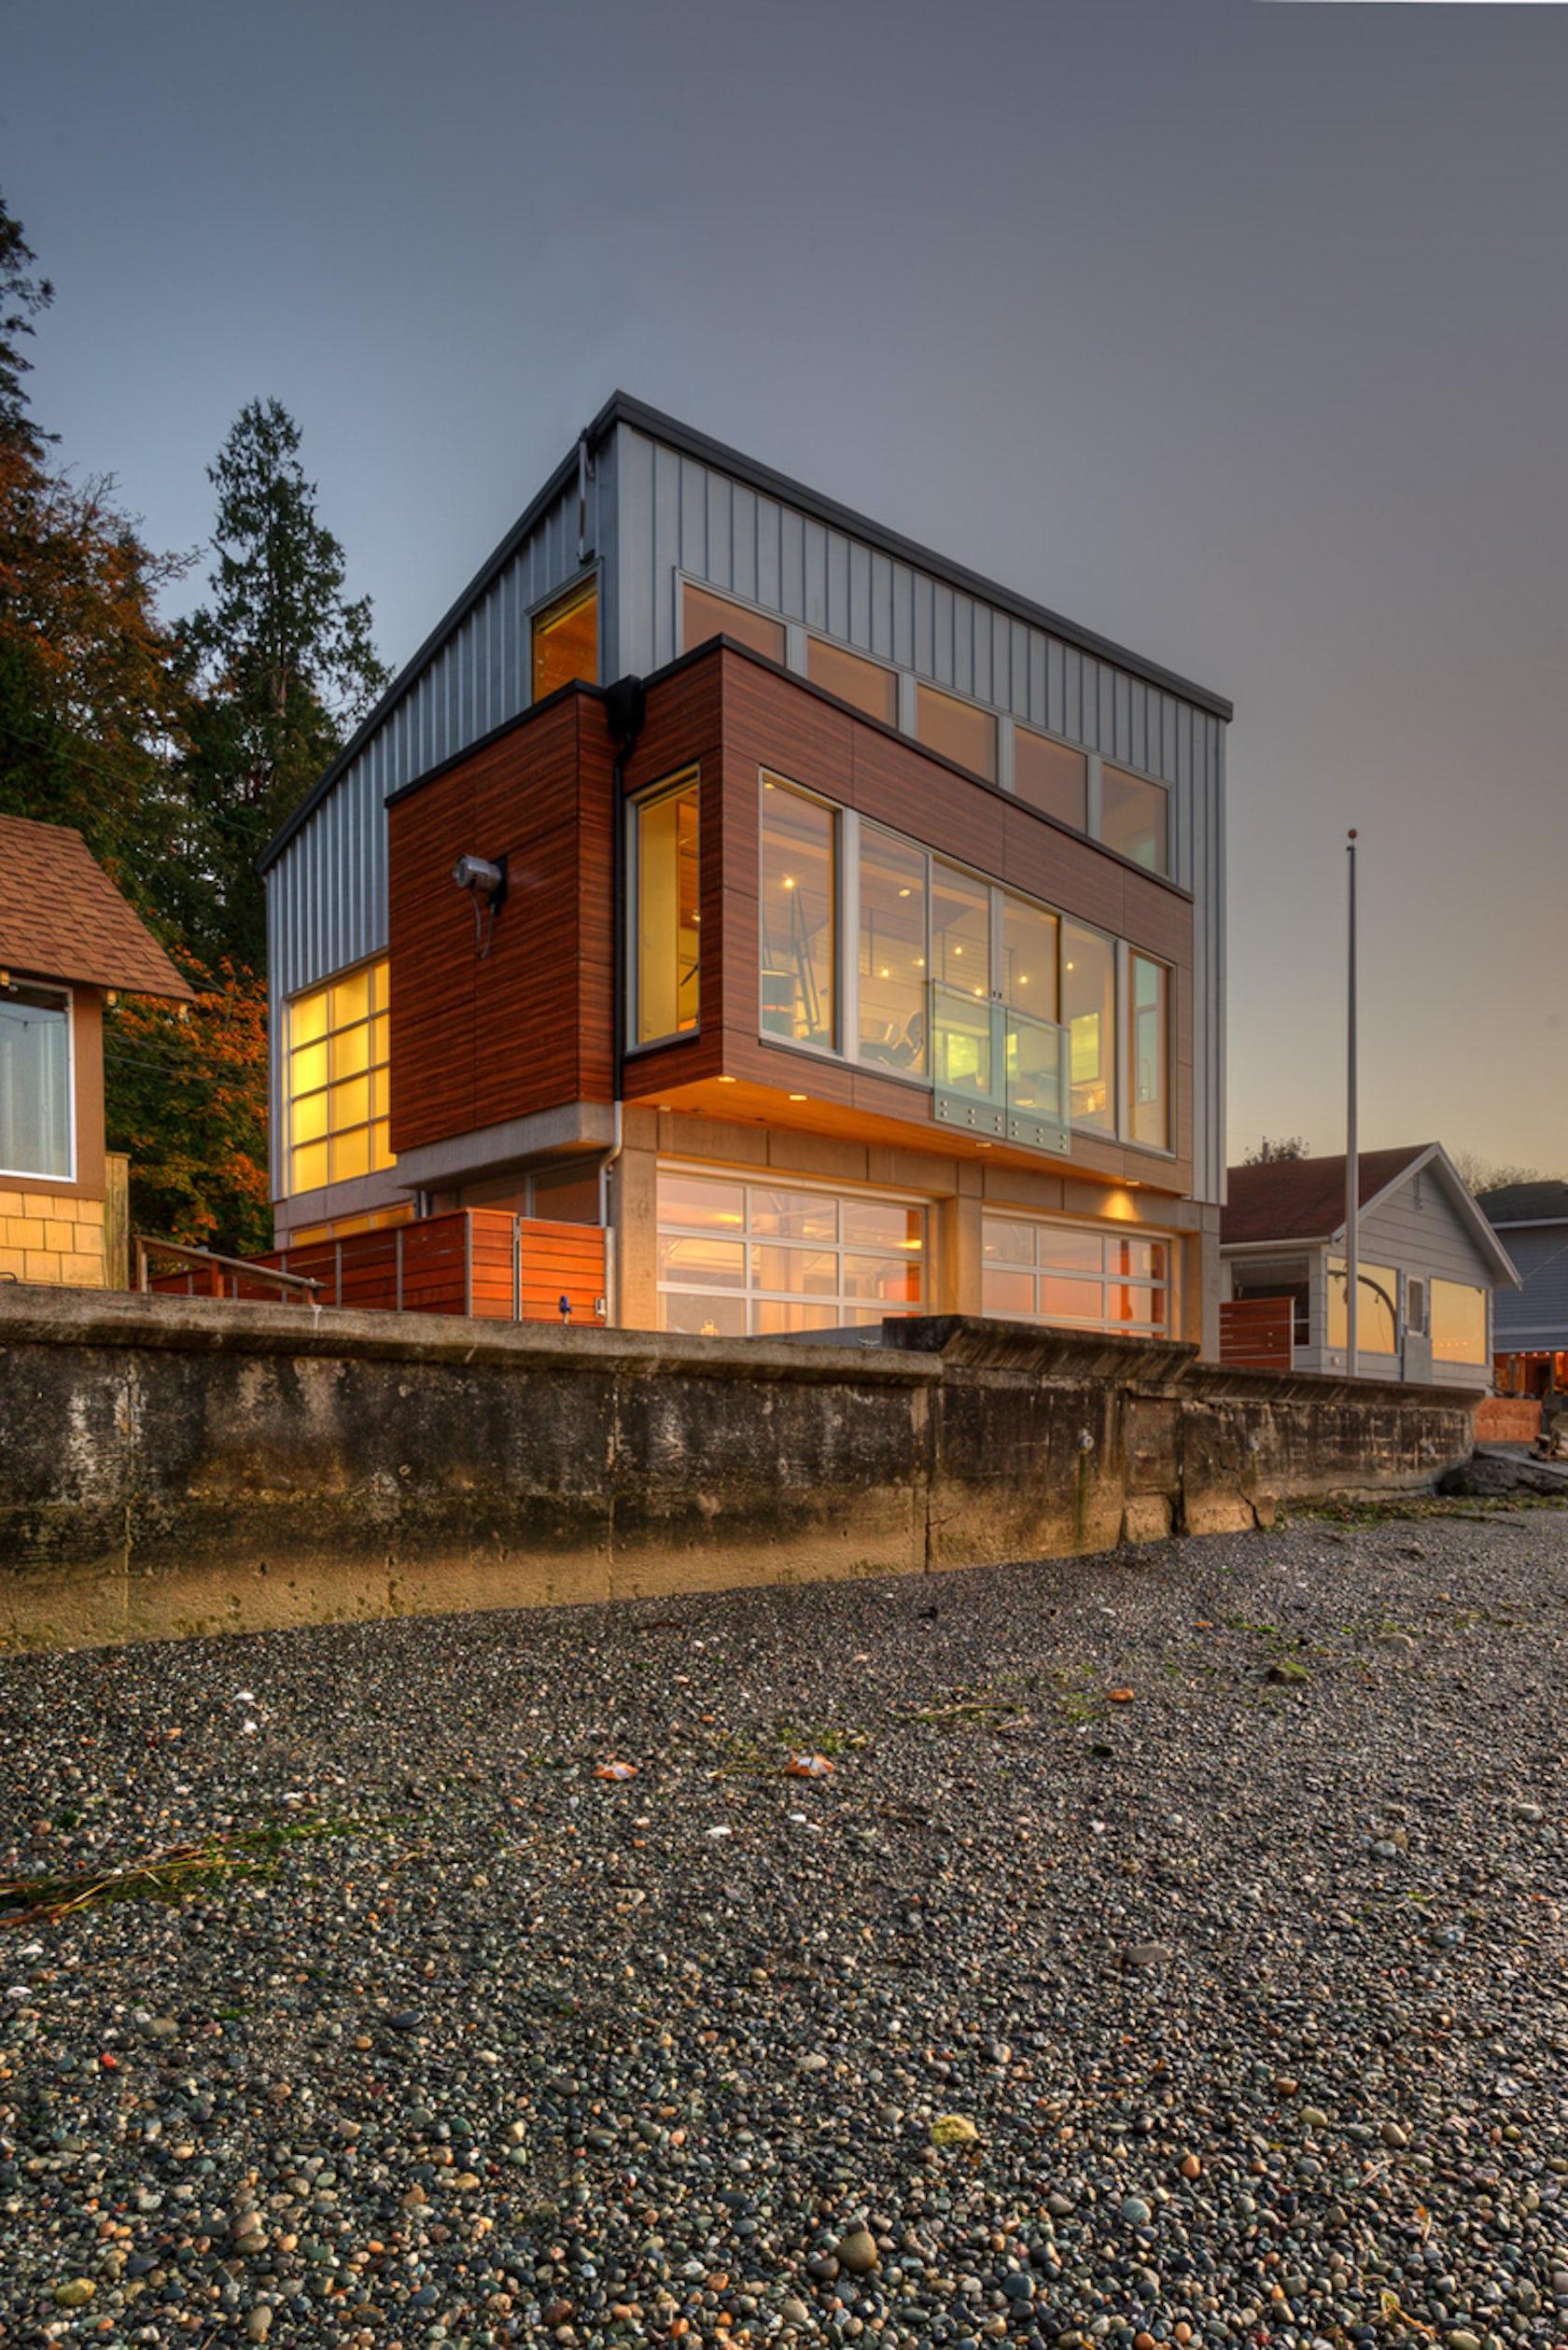 Designs northwest architects architizer for Northwest architects